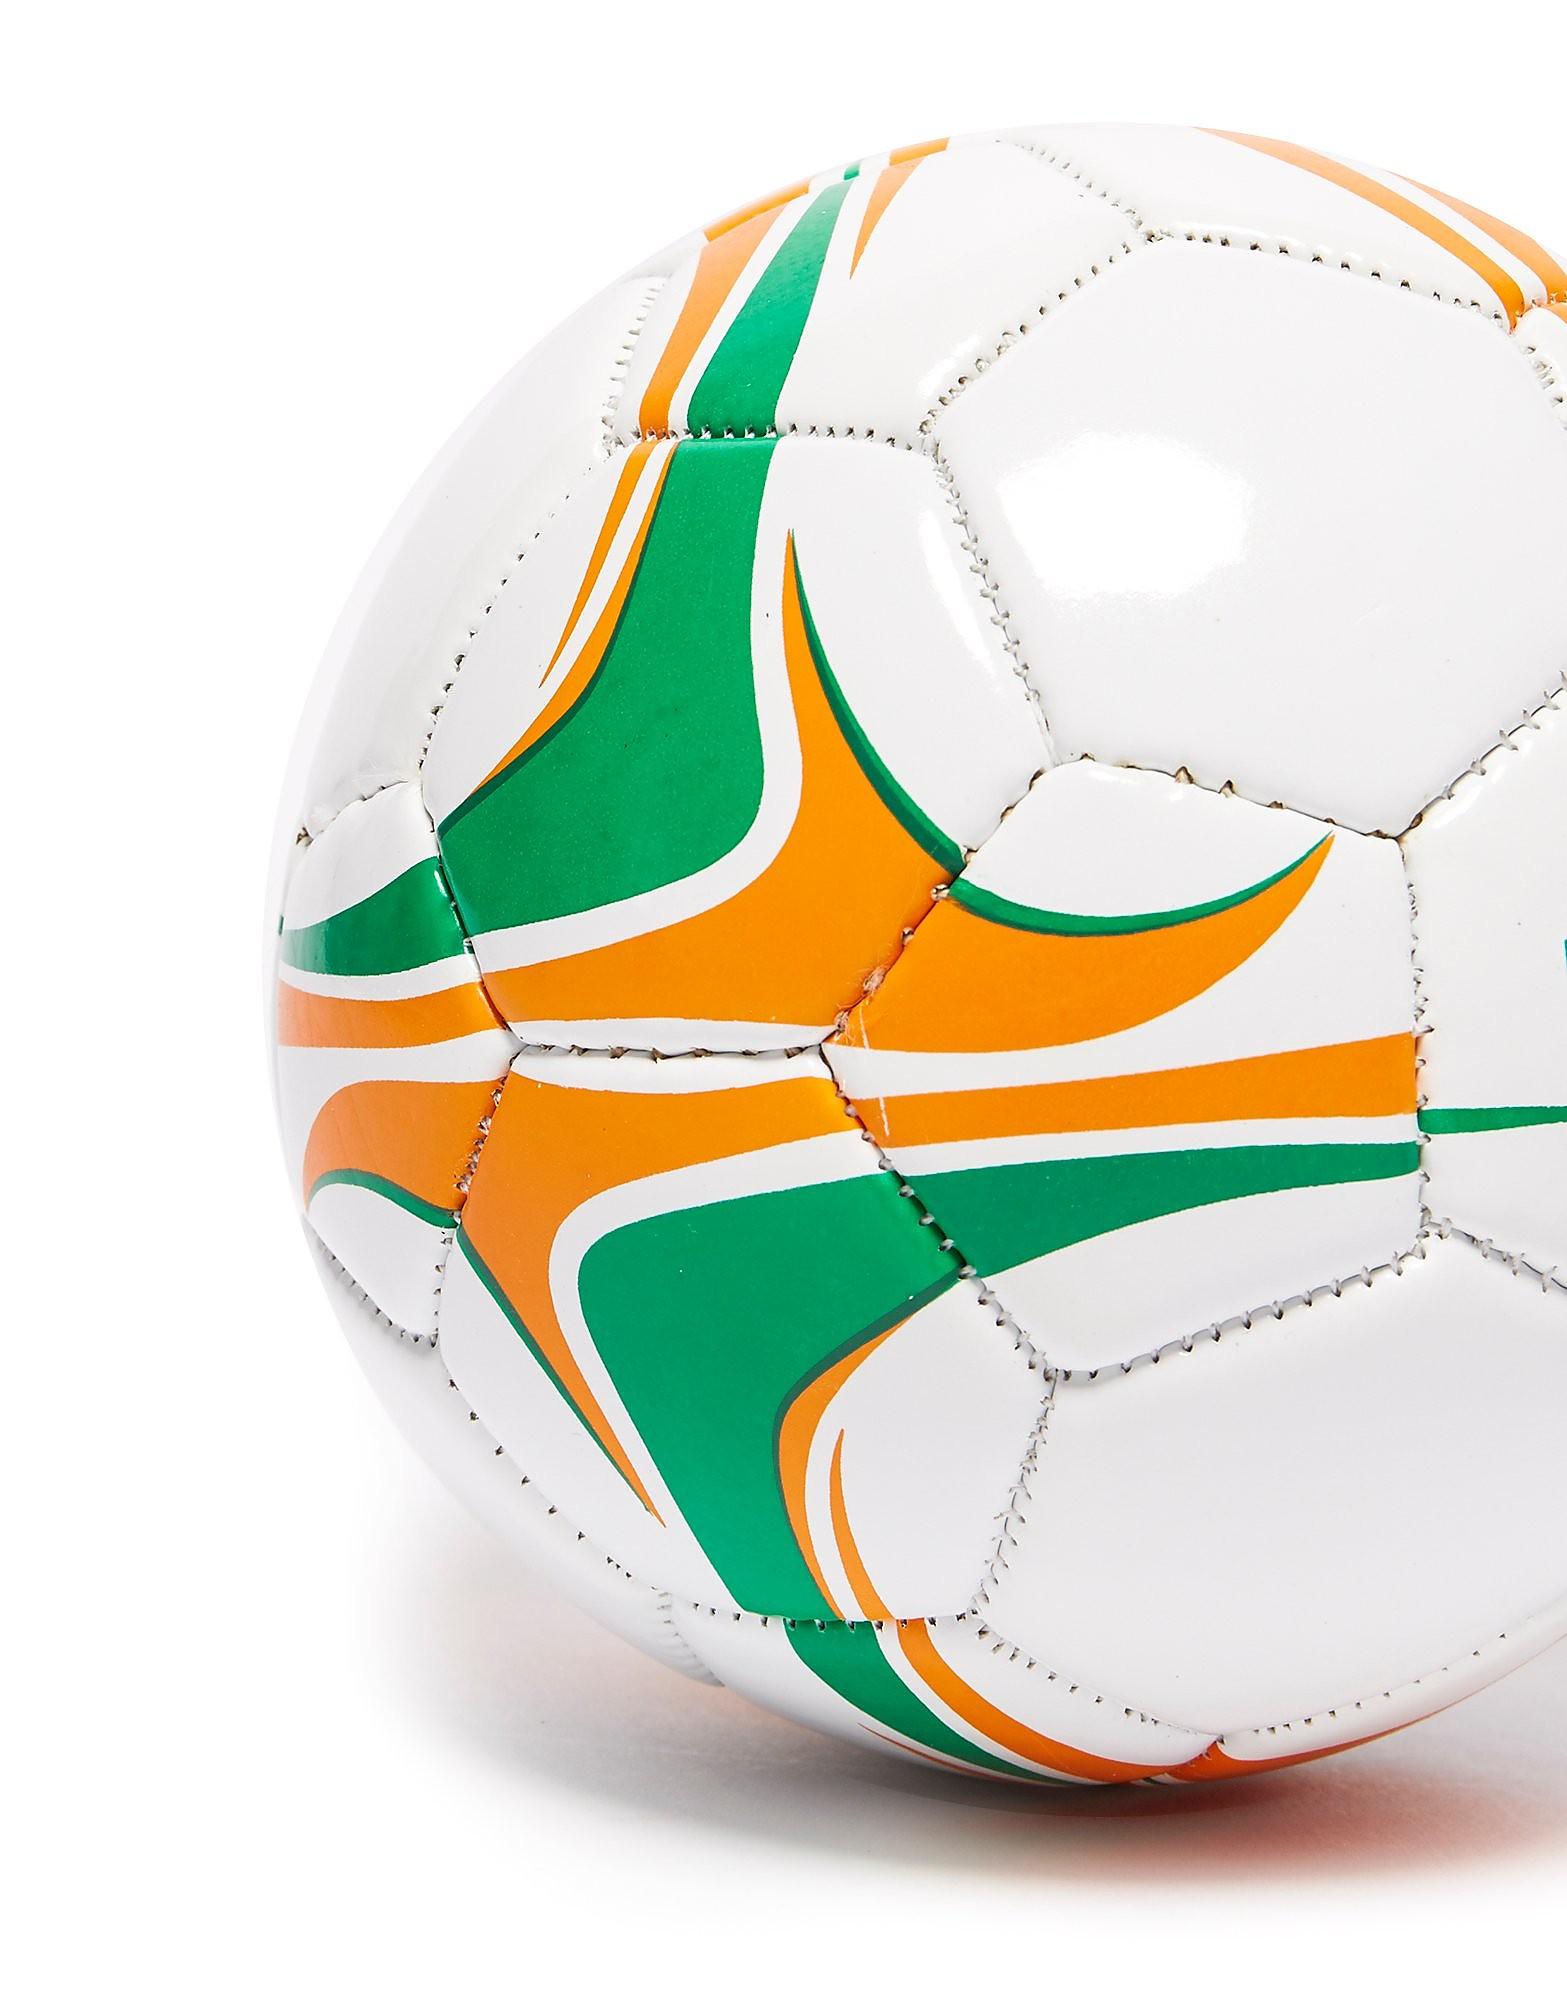 Daricia Irische Republik Mini Football